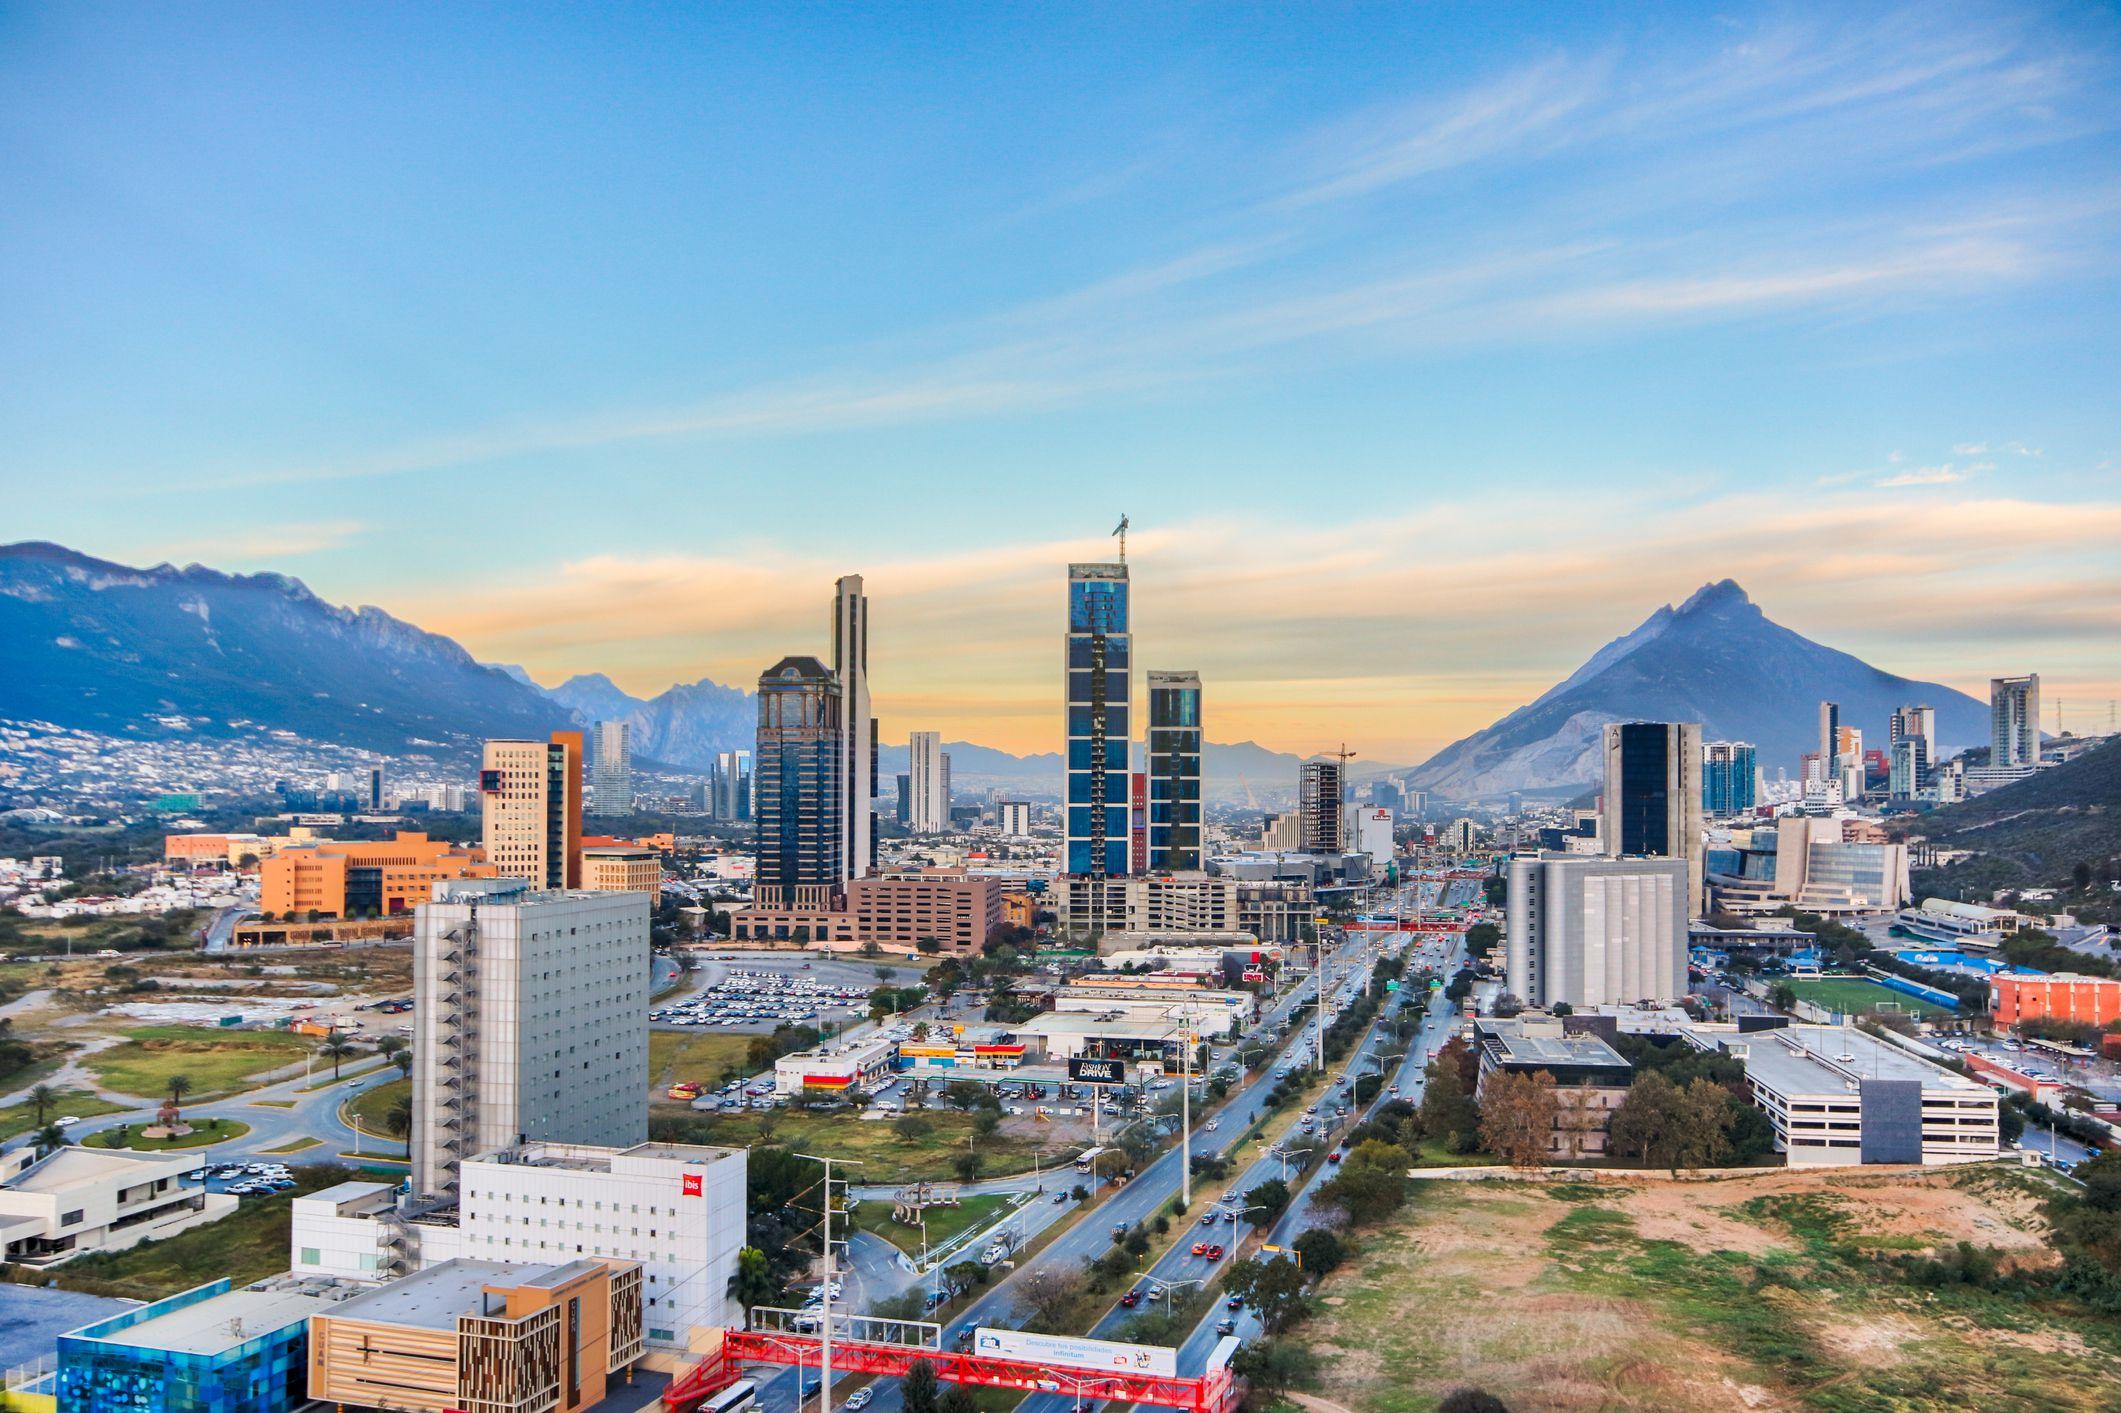 شهر مونتری مکزیک